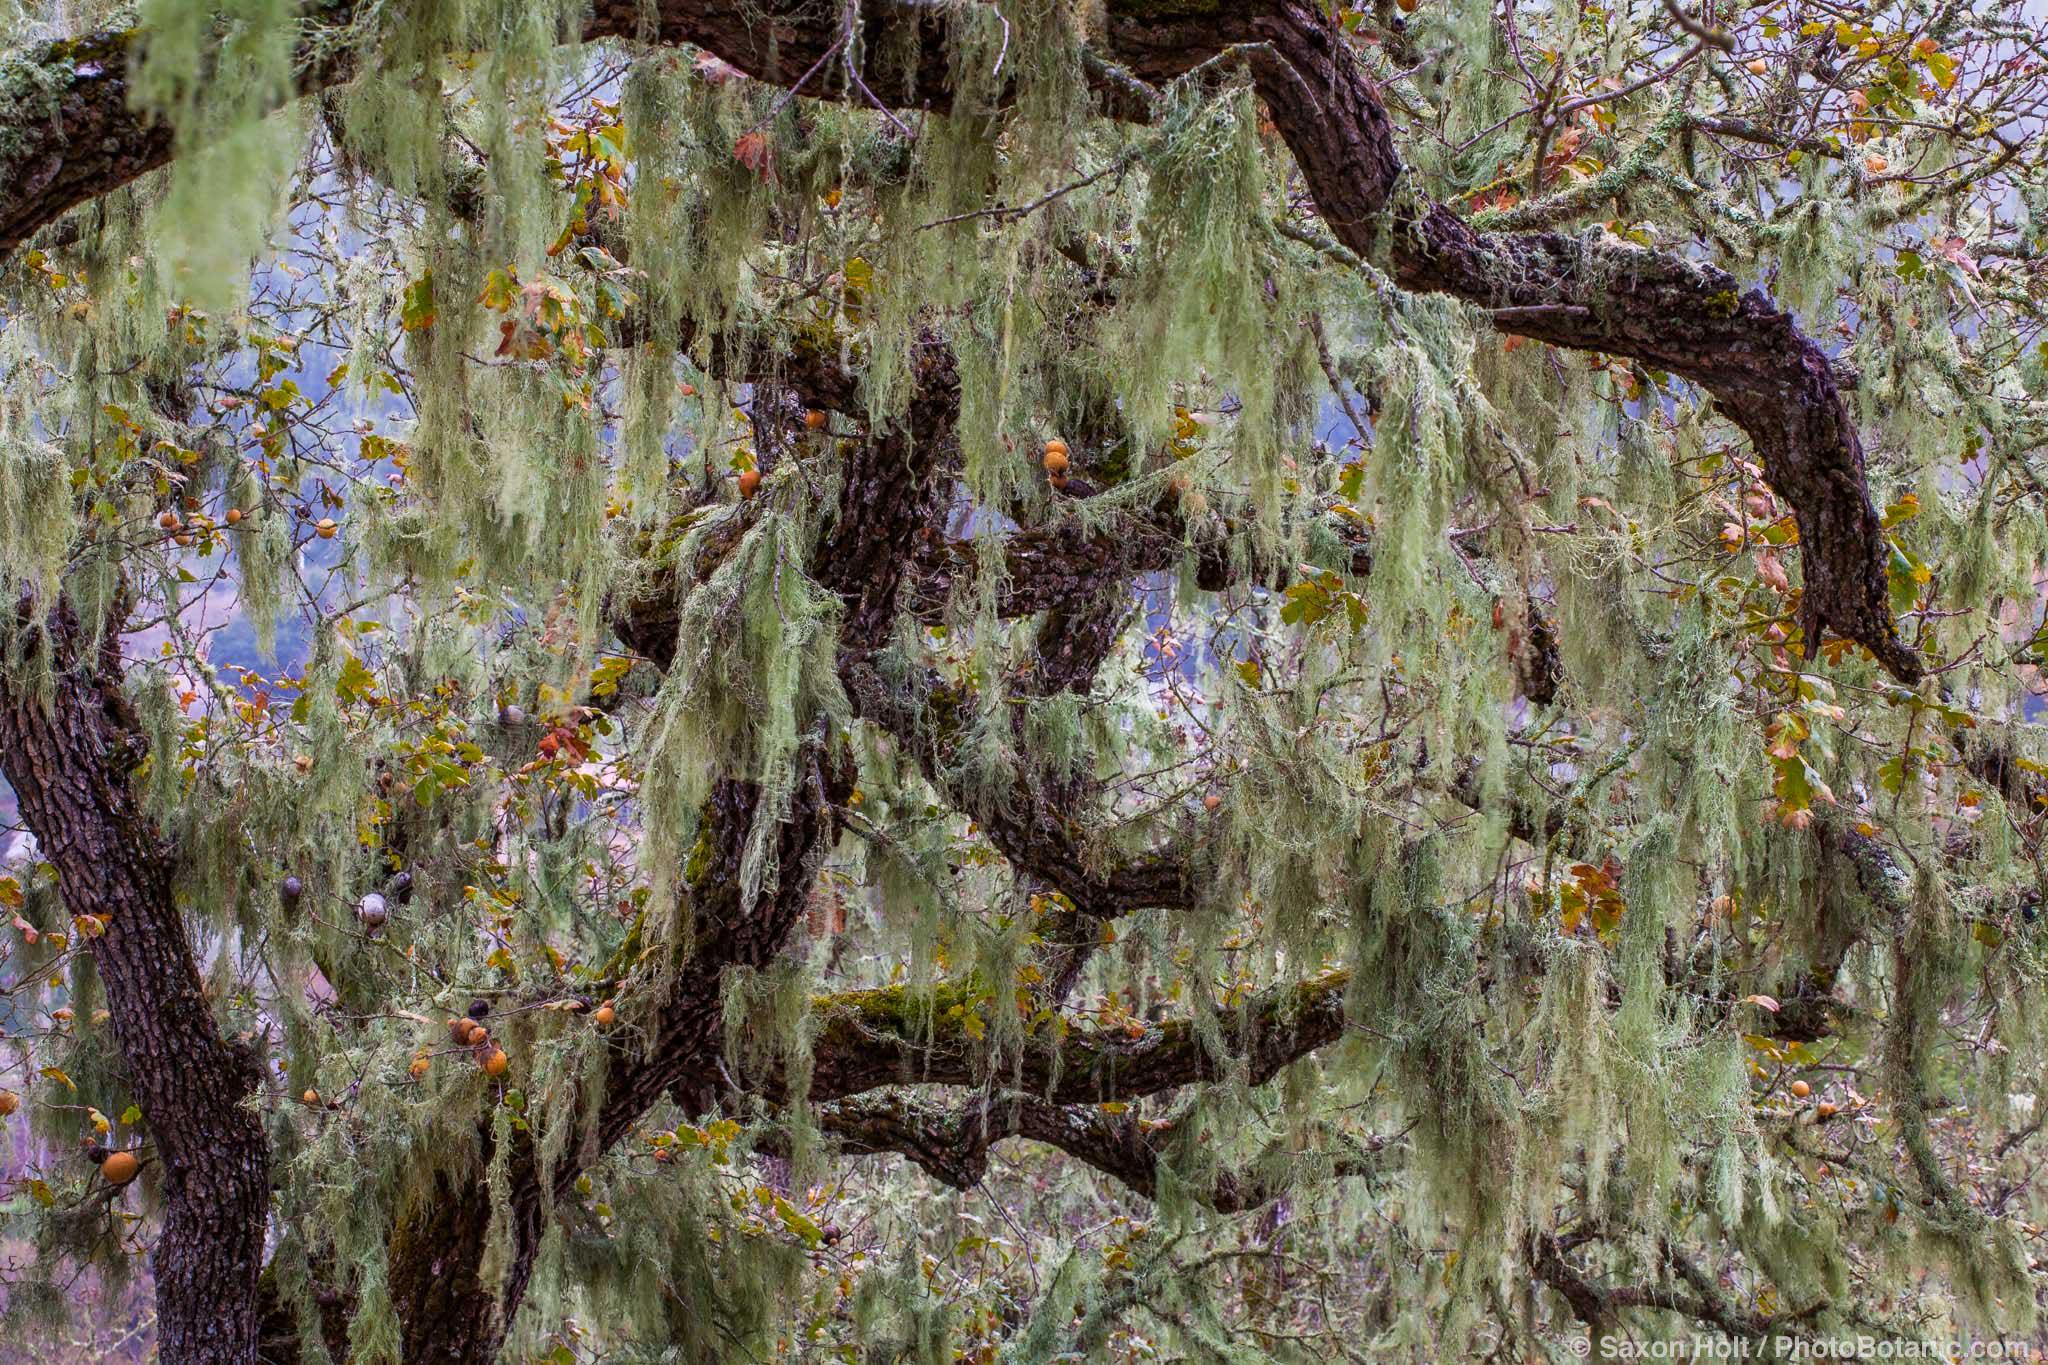 Lace lichen, or Ramalina menziesii Oak trees in autumn on Pinheiro Fire Road, Rush Creek Open Space, Marin County